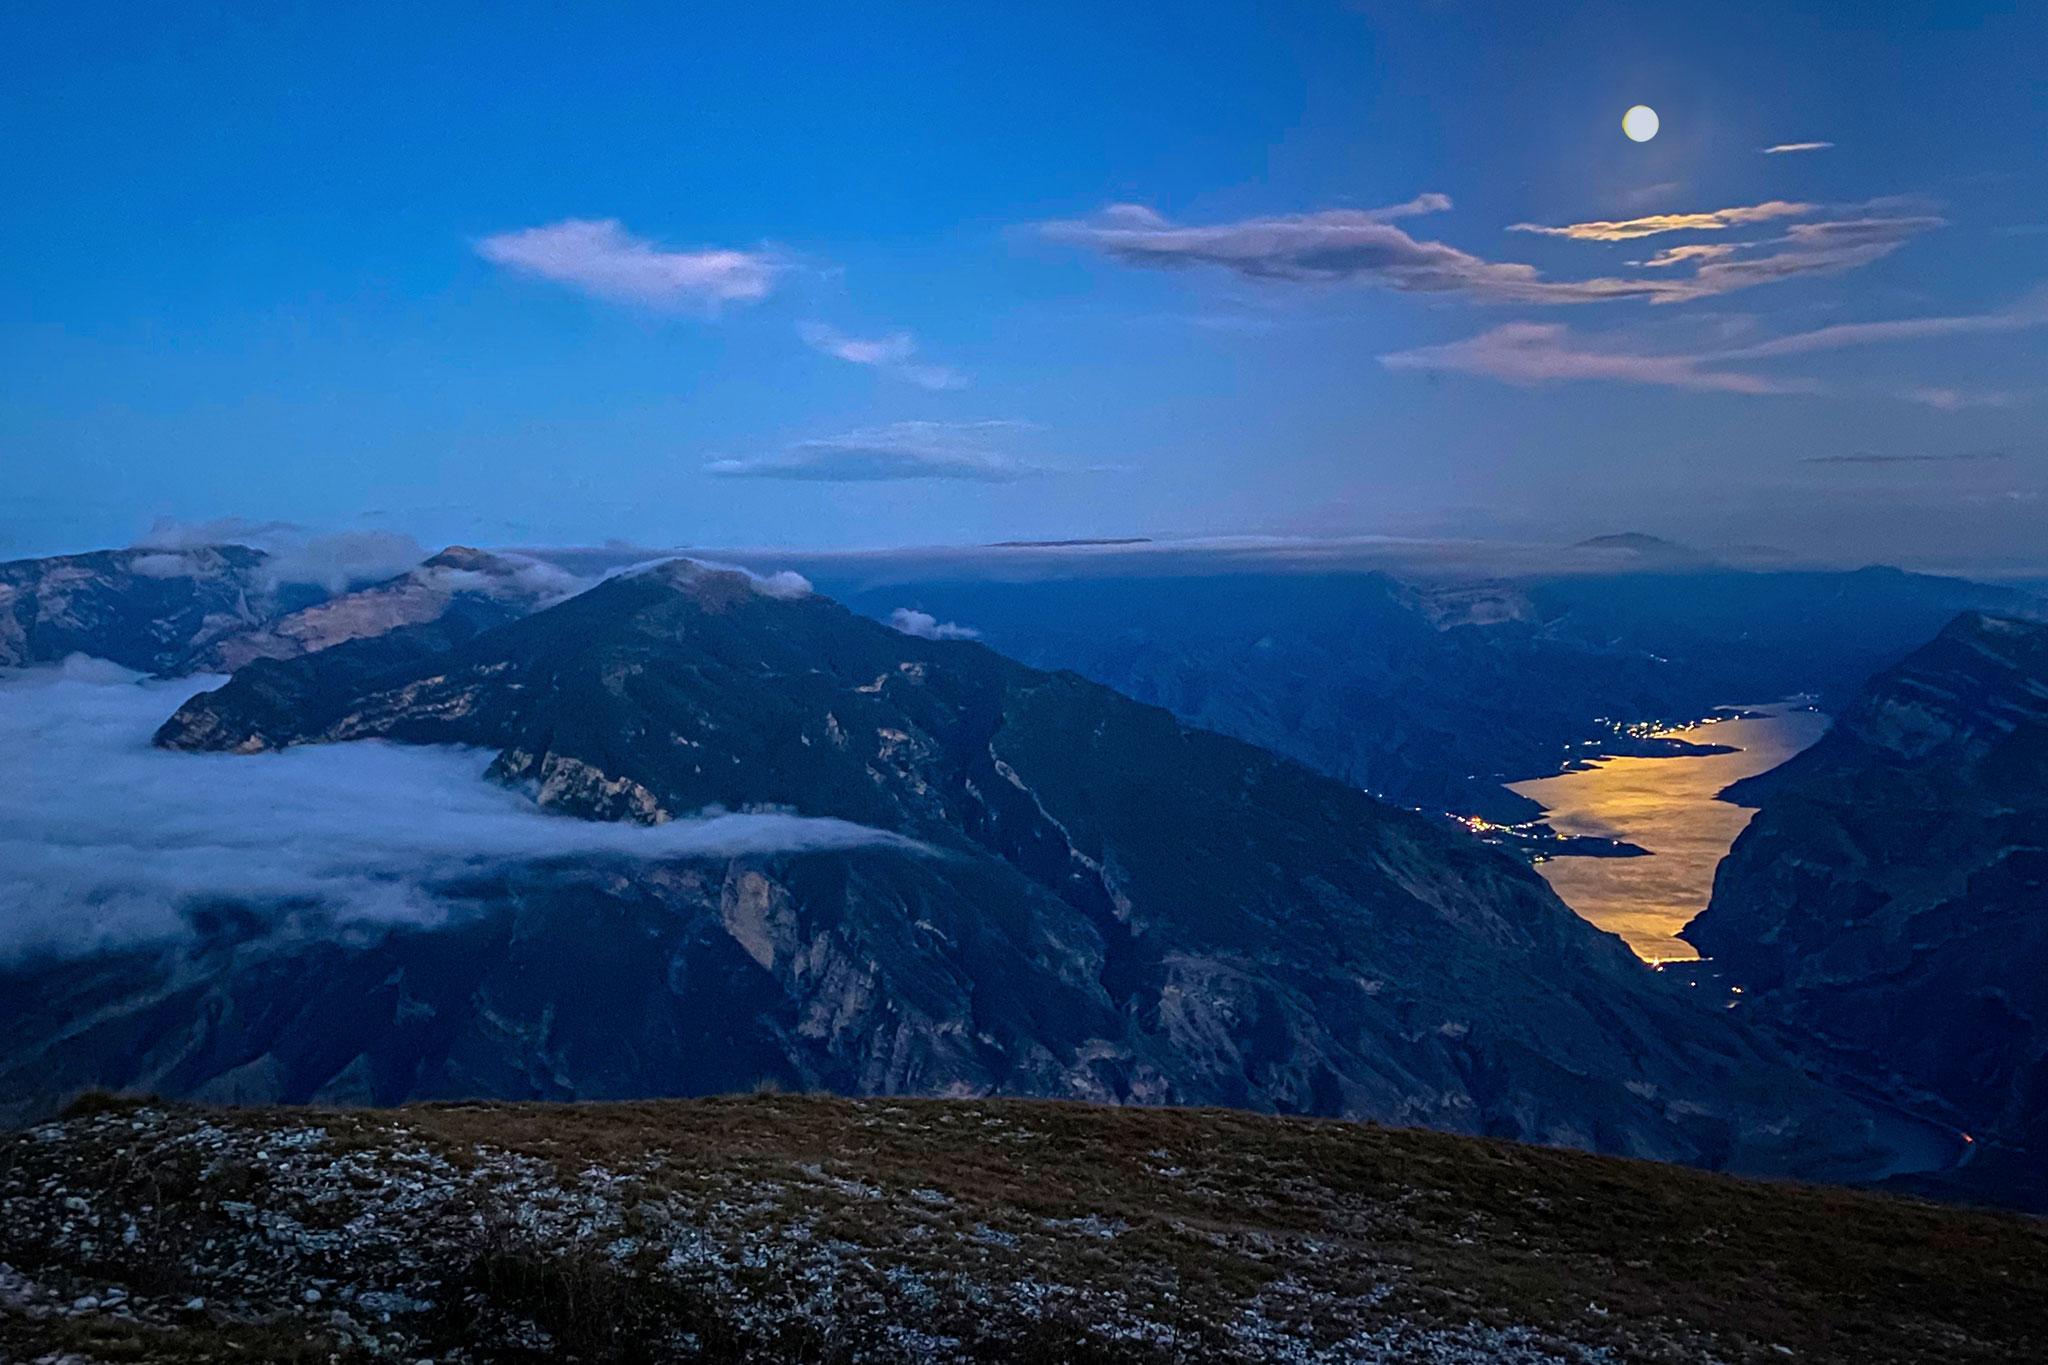 Campfires under a full moon